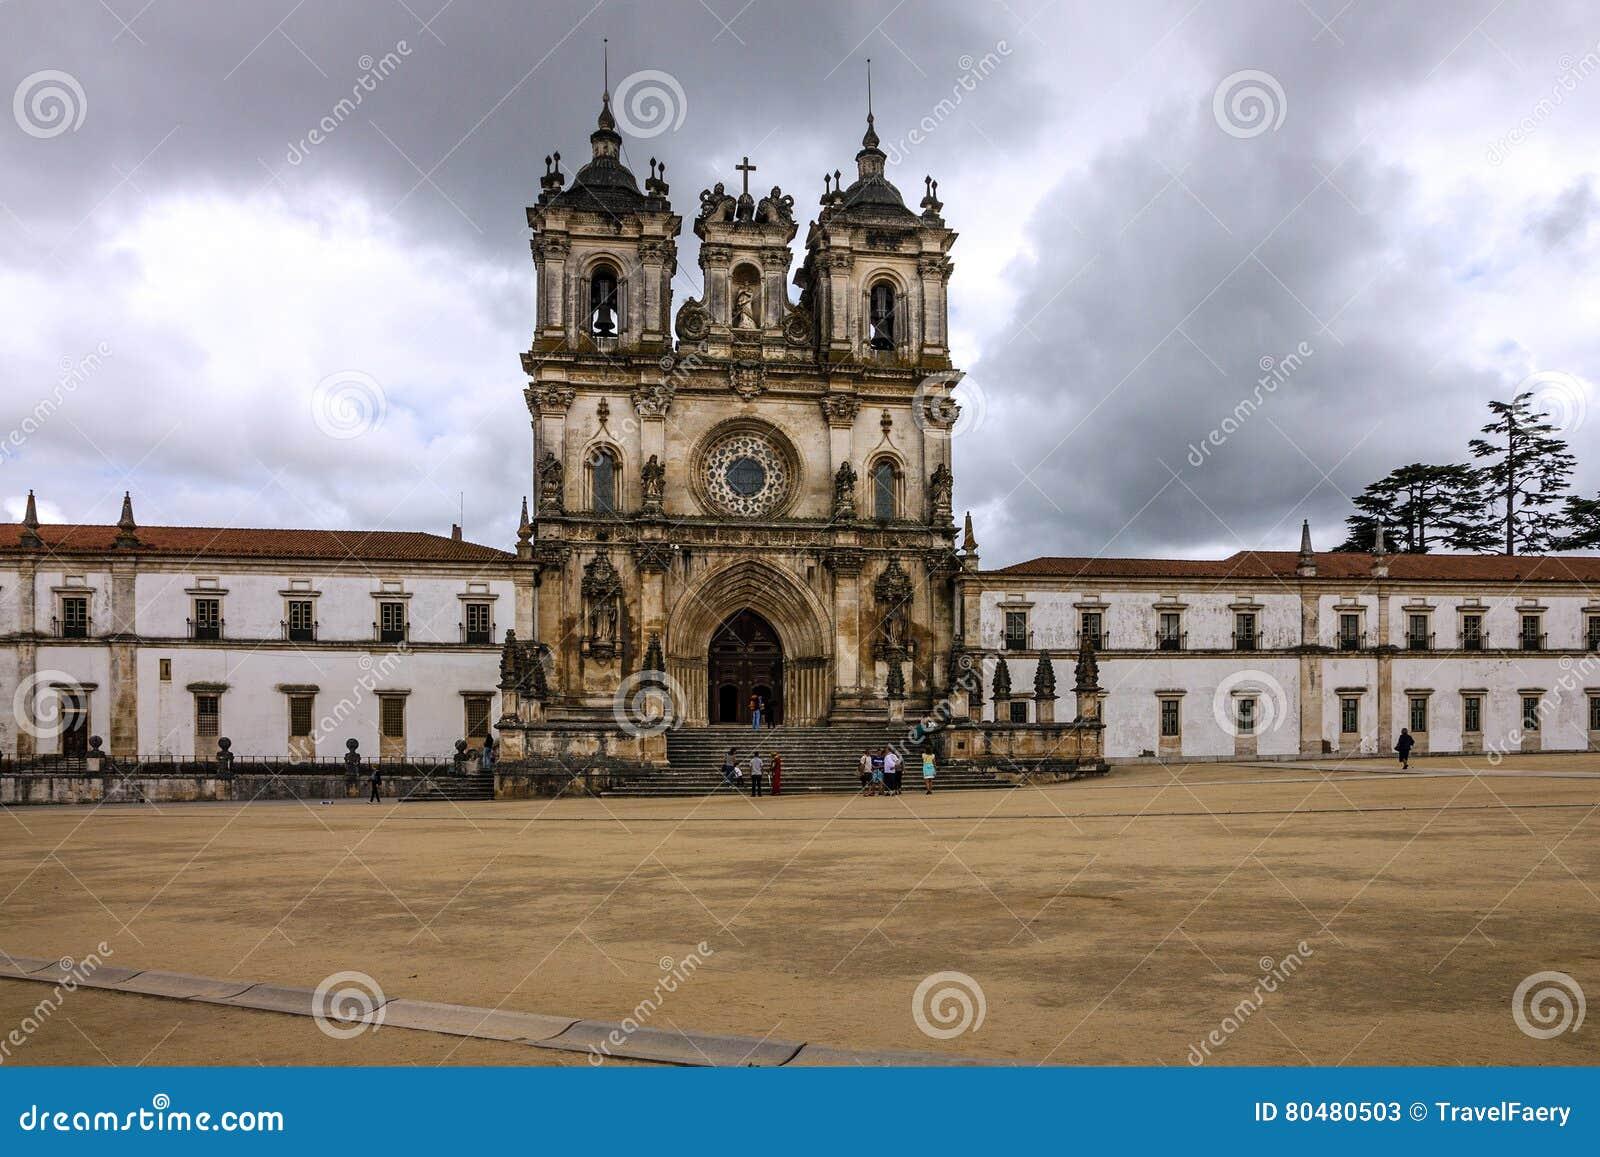 Alcobaca Medieval Roman Catholic Monastery, Portugal